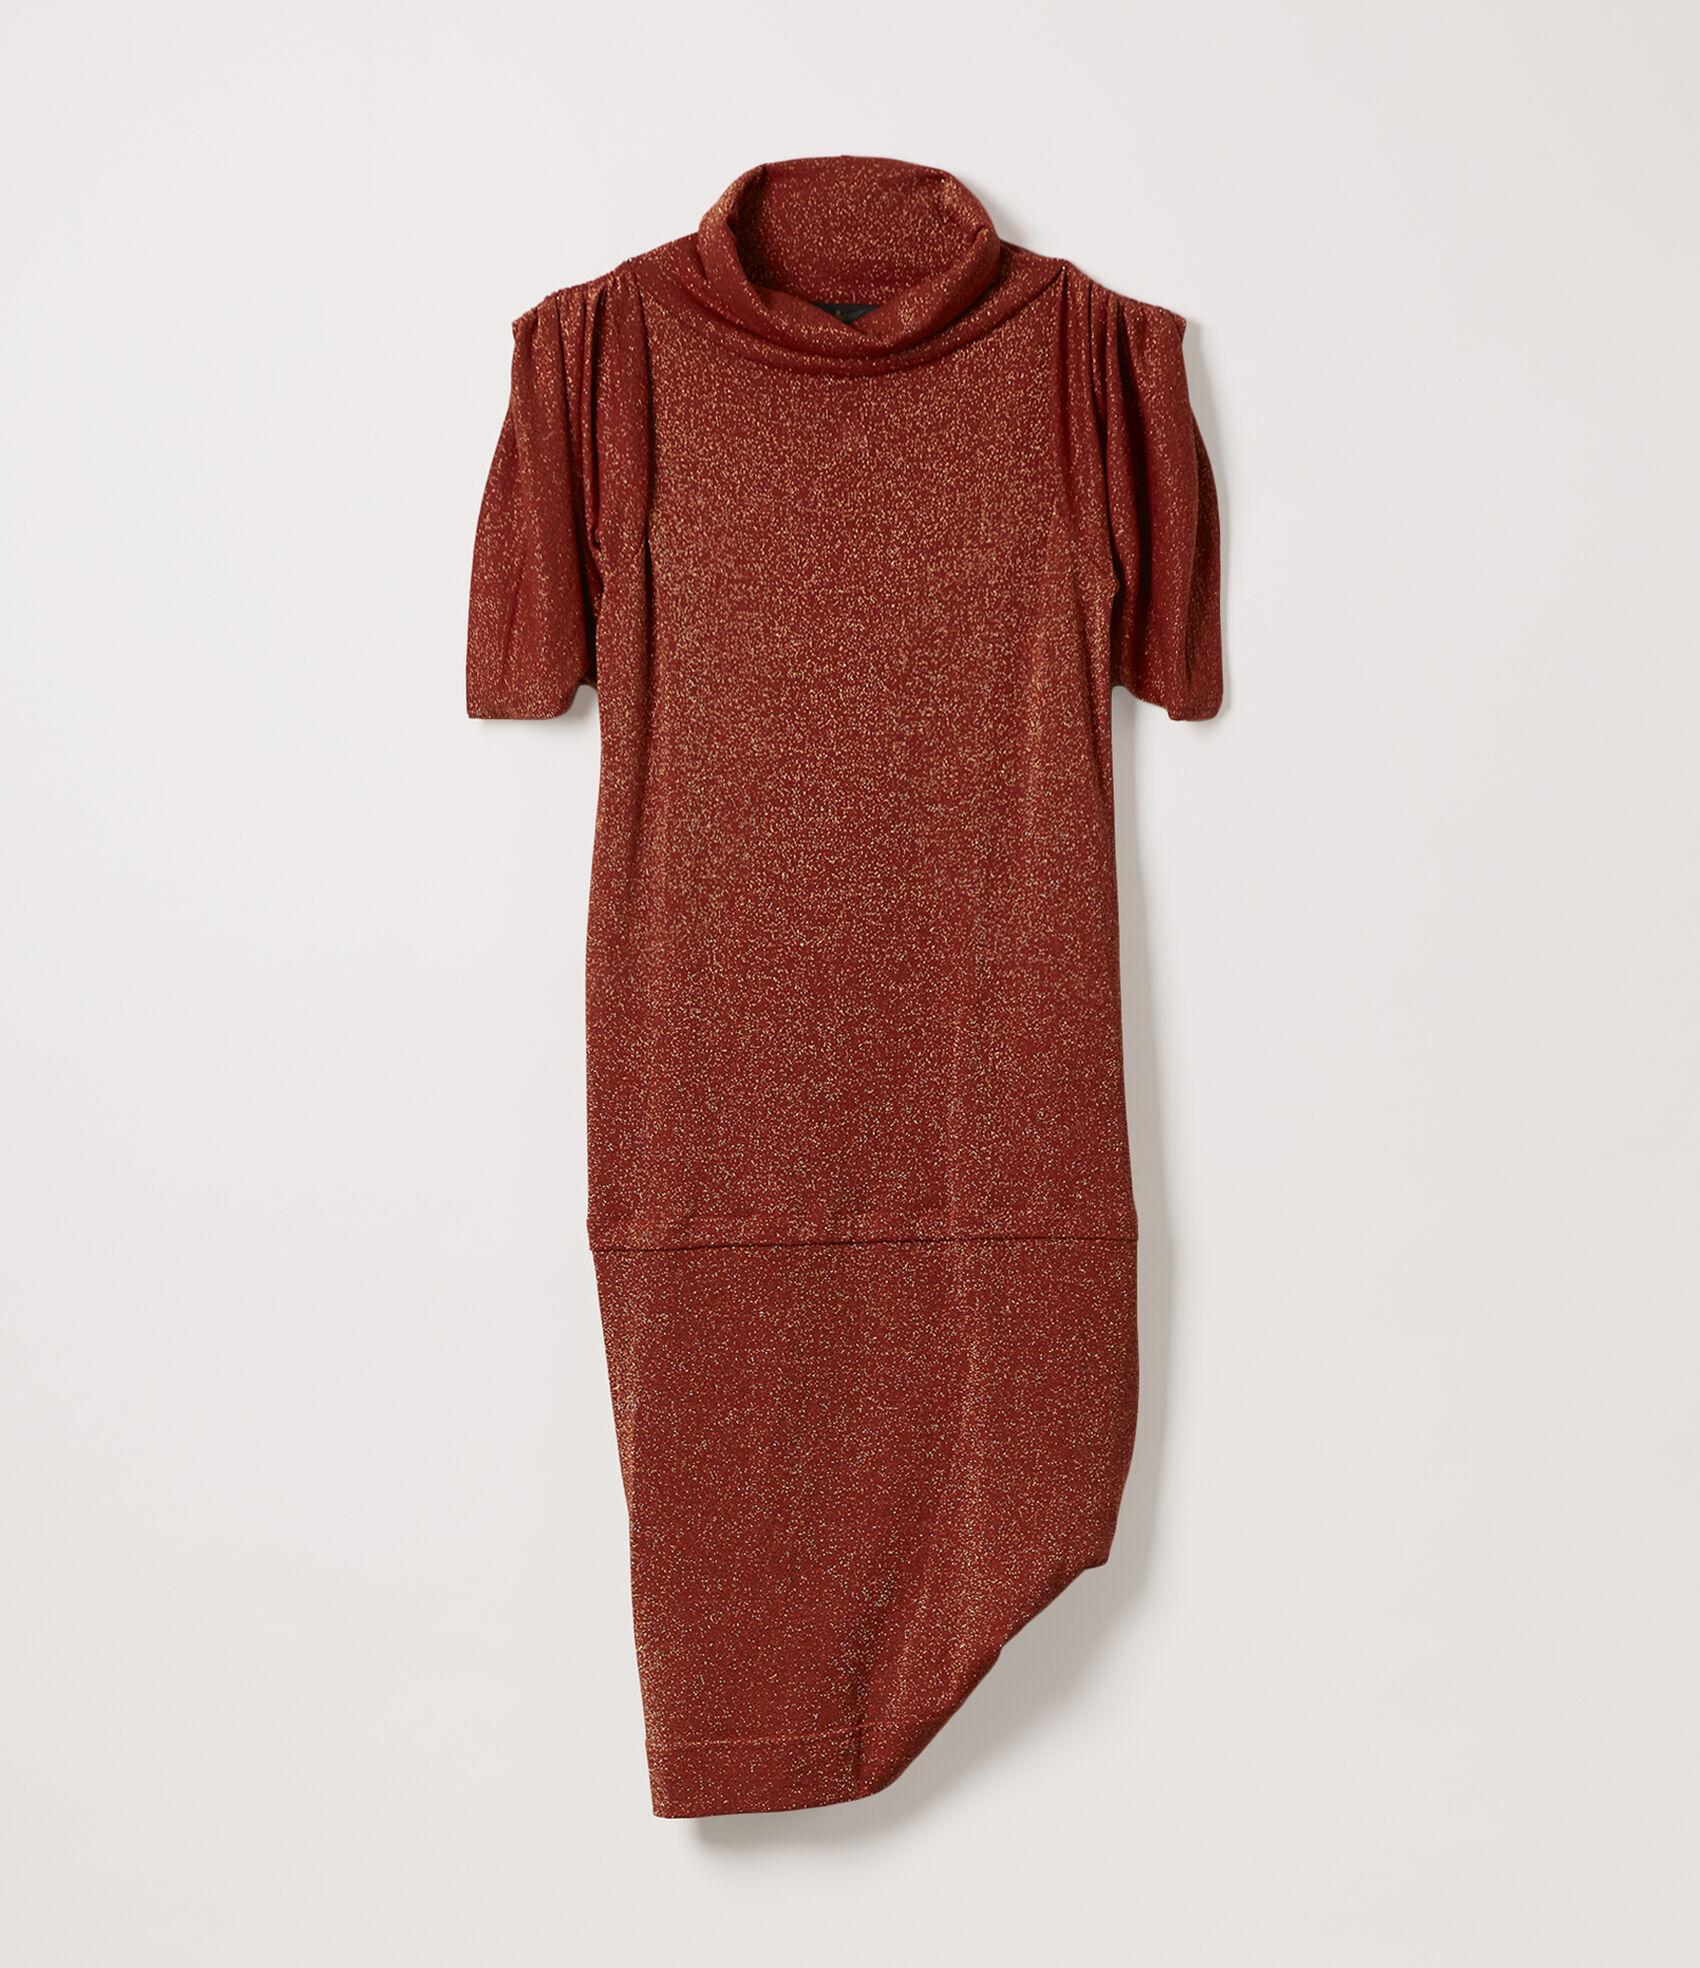 6f9f3a7df Vivienne Westwood Women's Designer Tops and Shirts   Women' clothing    Vivienne Westwood - Punkature Dress Rust